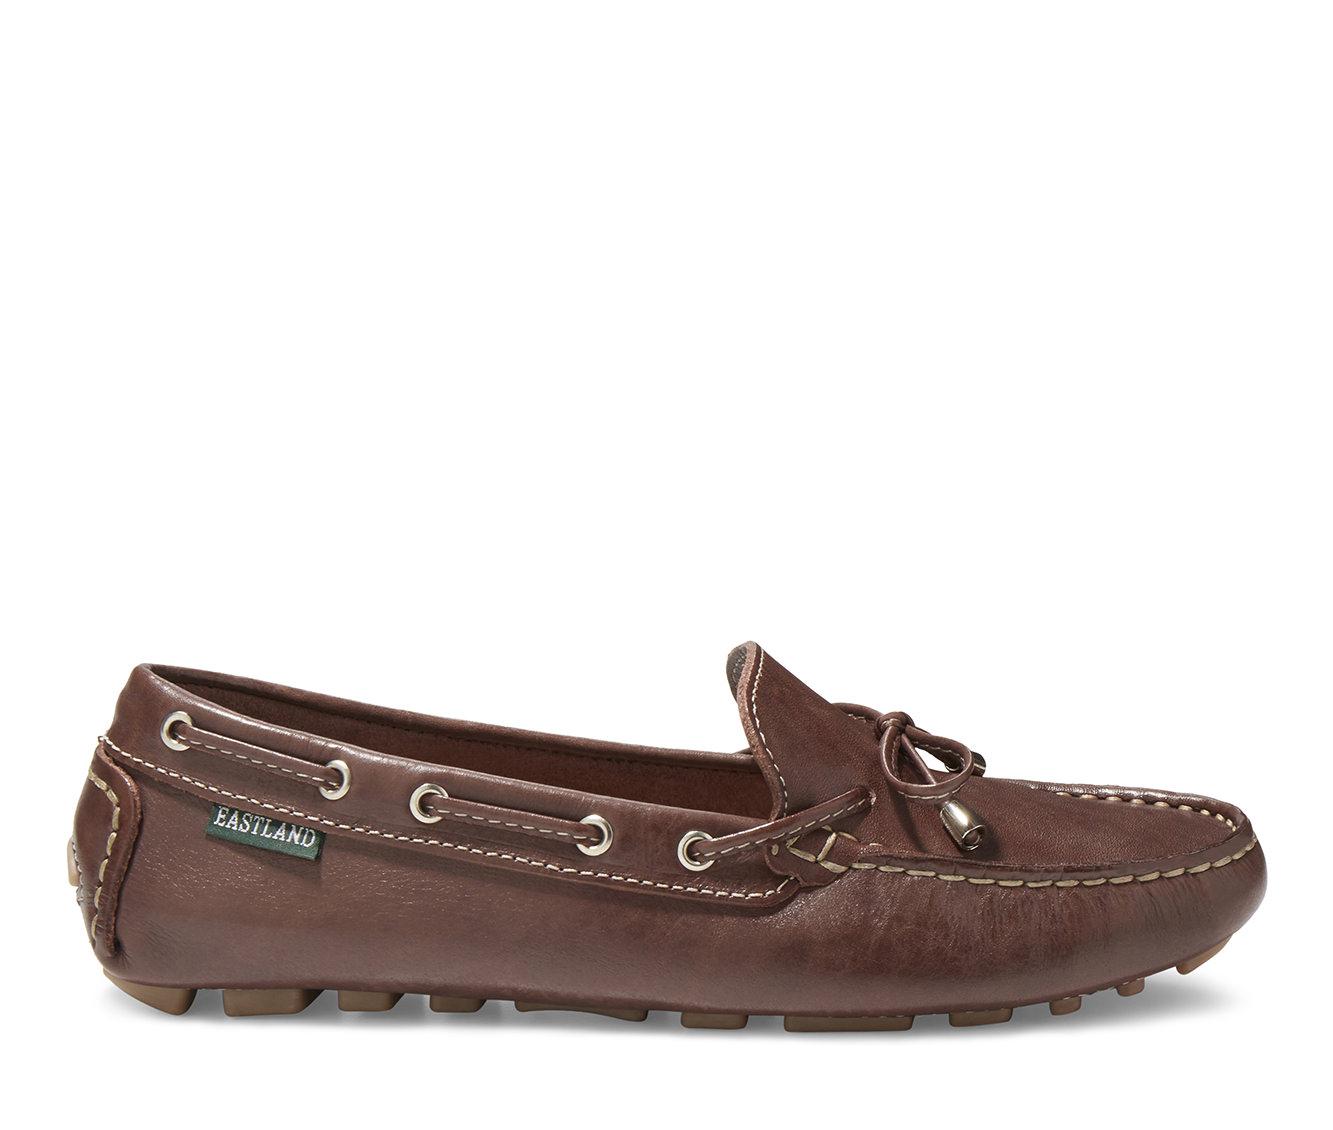 Eastland Marcella Women's Shoe (Brown Leather)